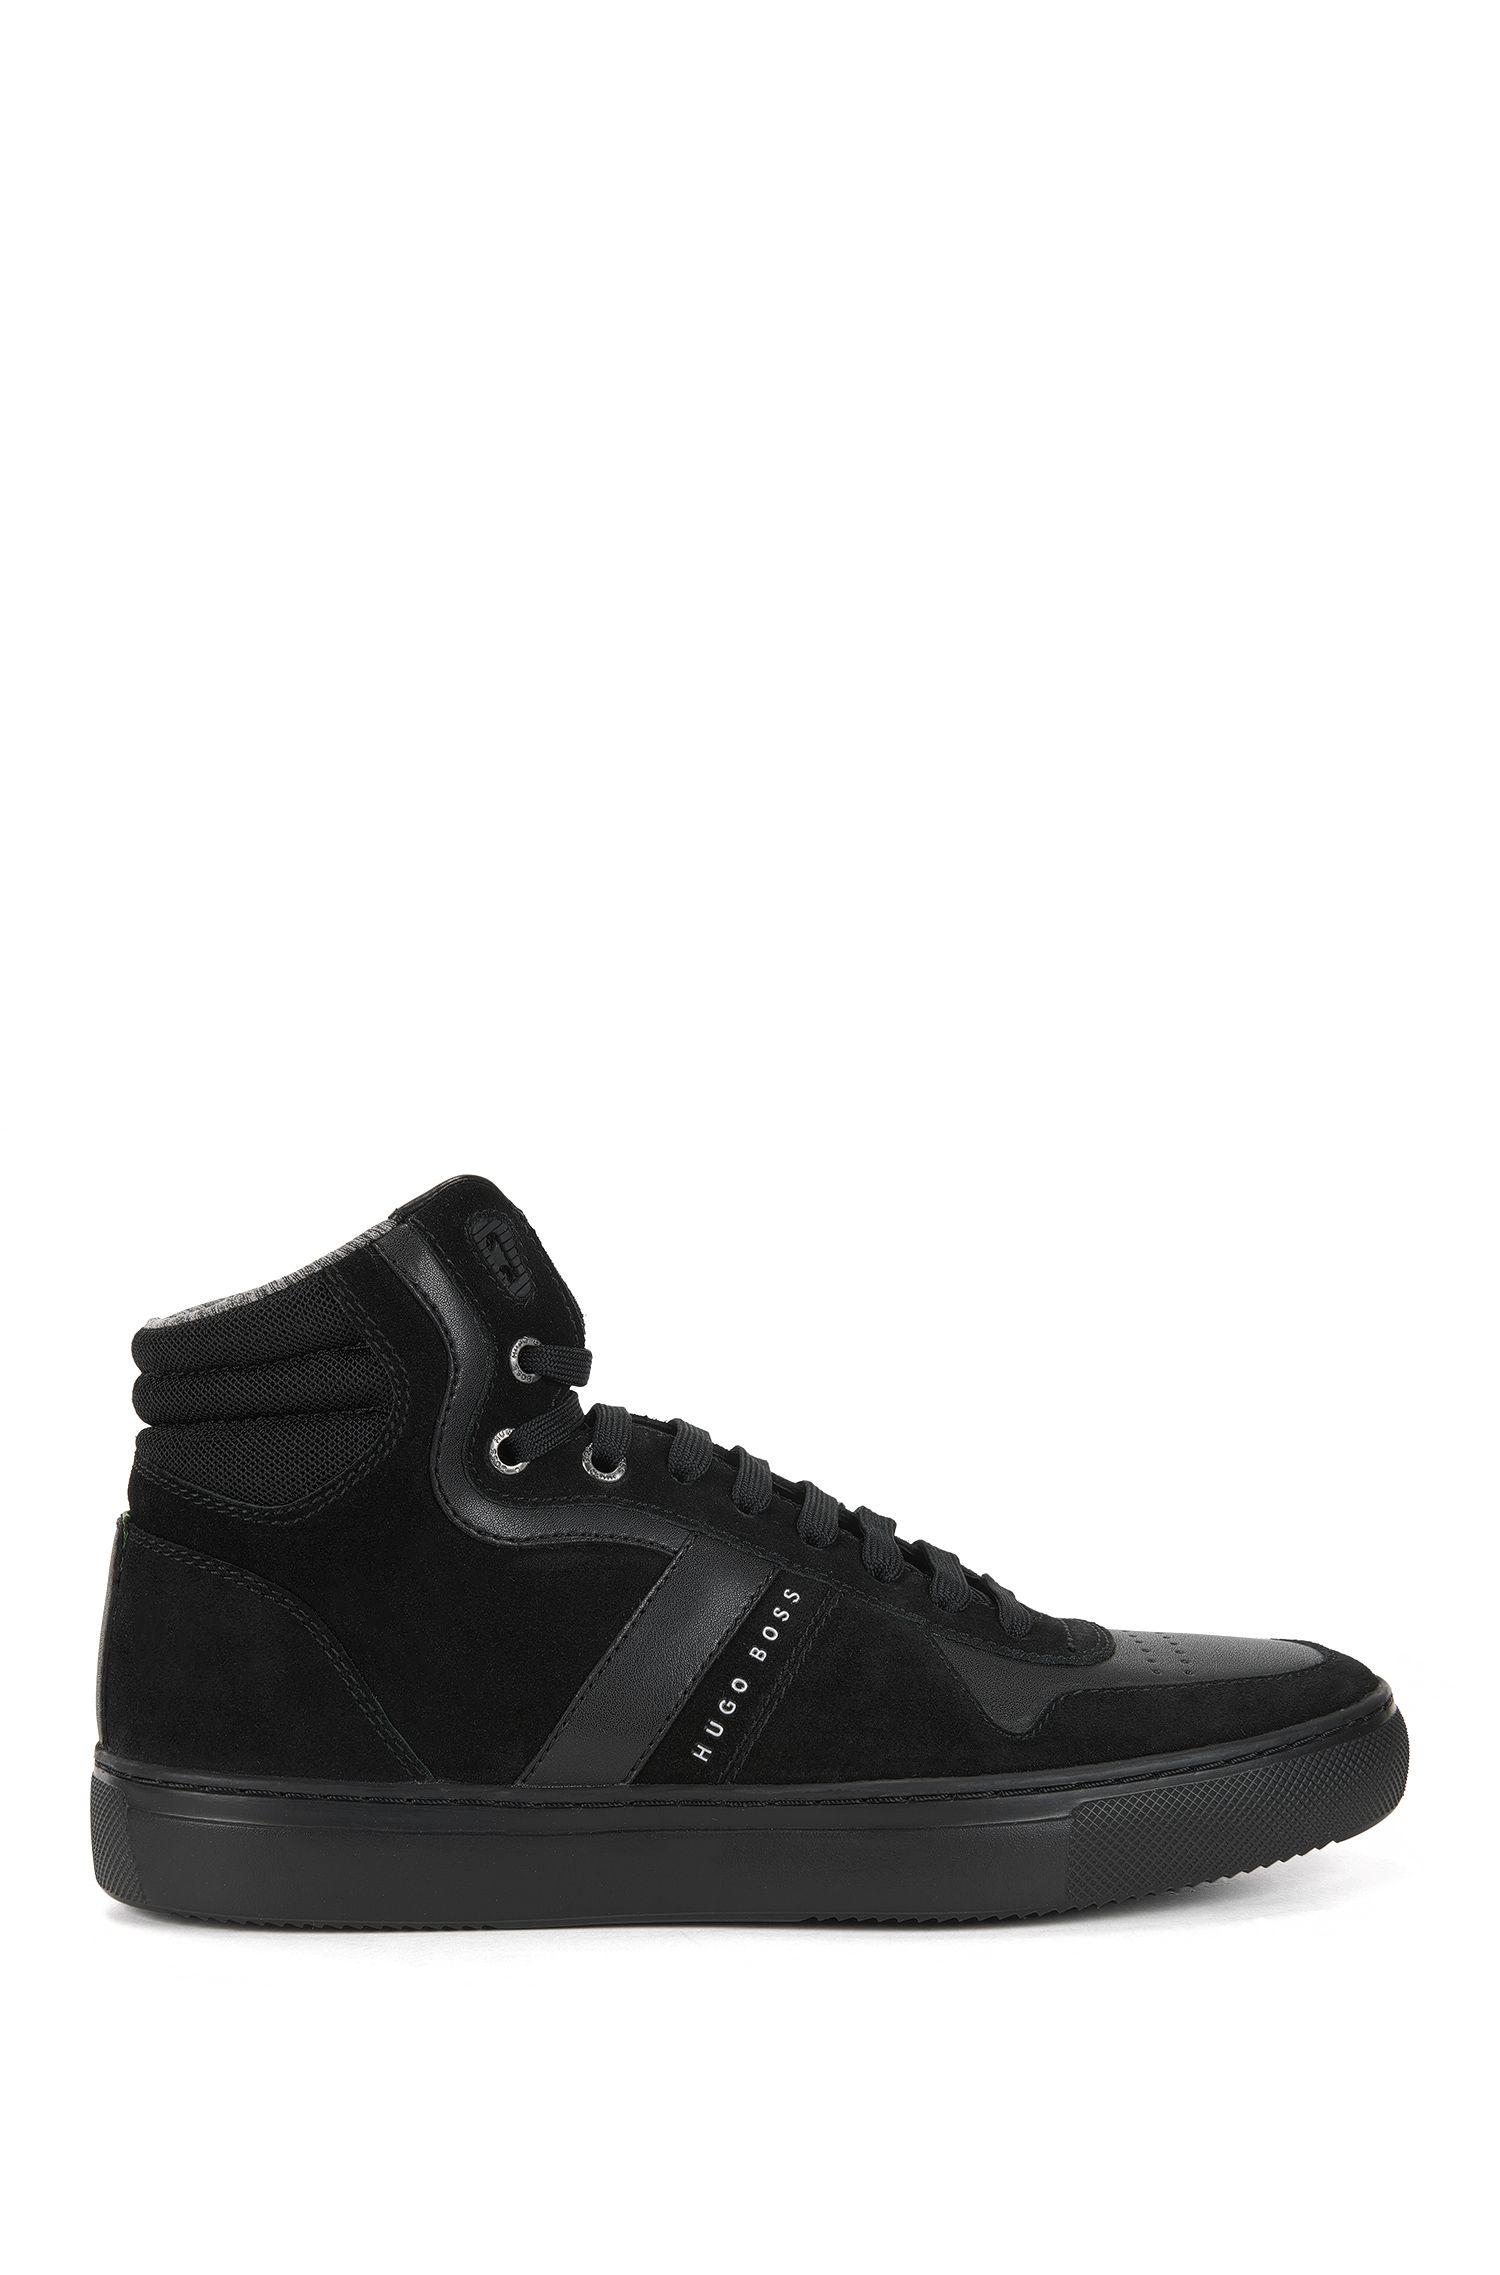 Sneakers high-top in pelle e pelle scamosciata